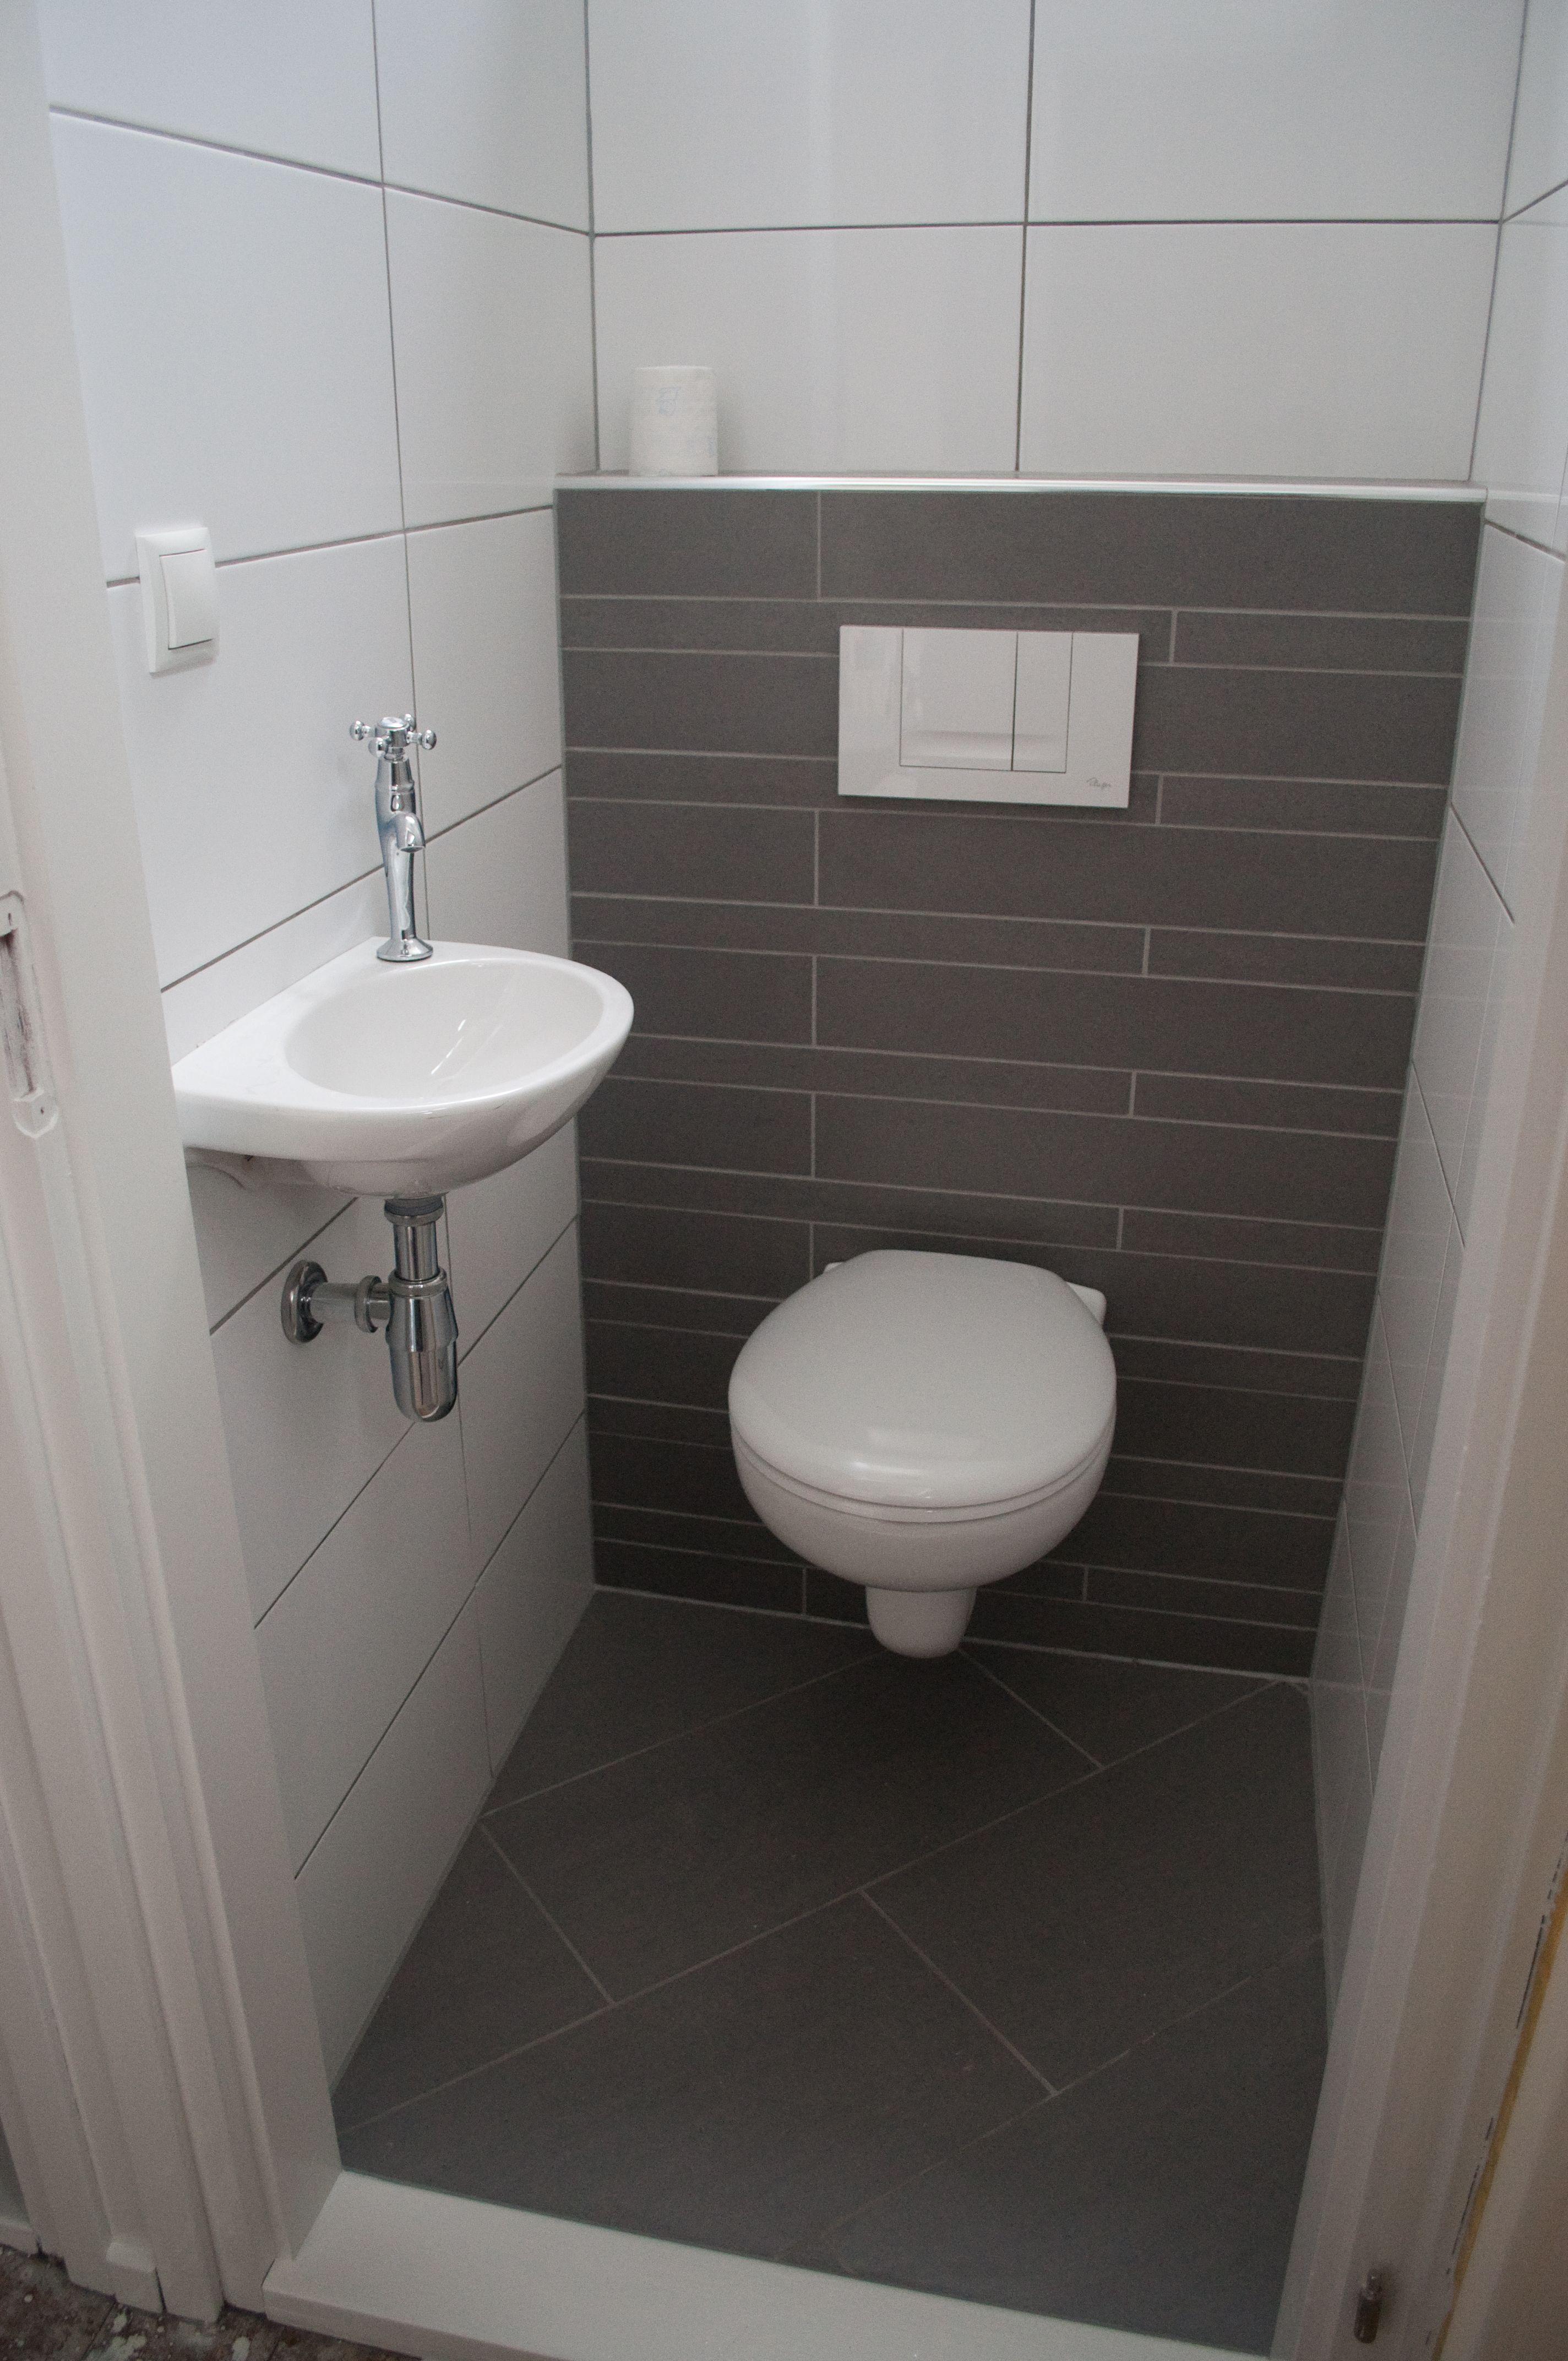 koof afzuigkap google zoeken wc pinterest. Black Bedroom Furniture Sets. Home Design Ideas